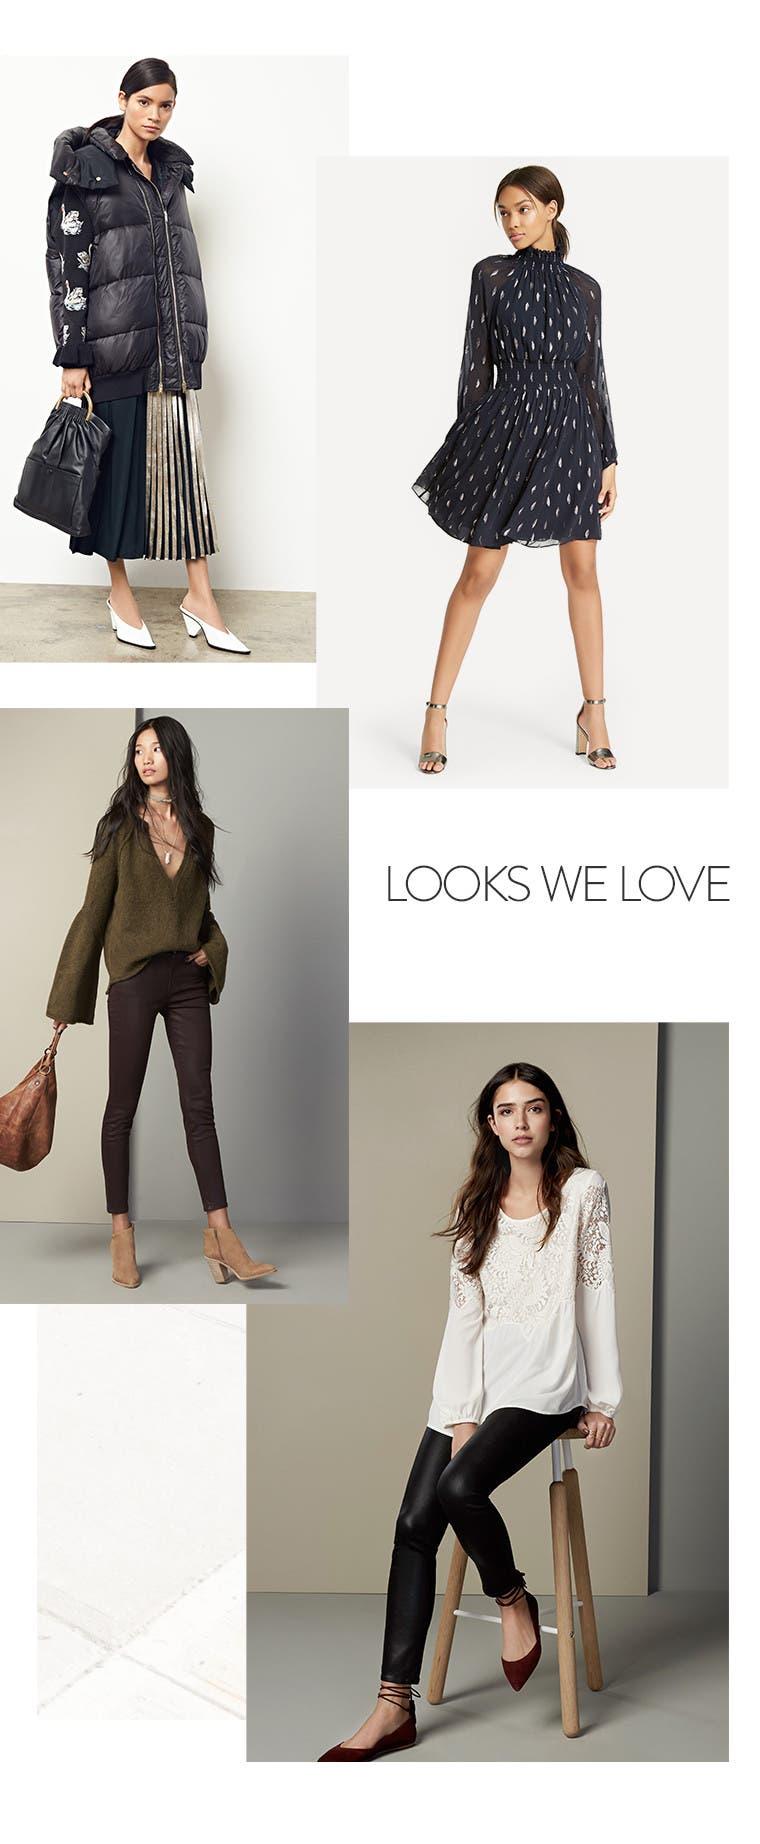 Women's looks we love.